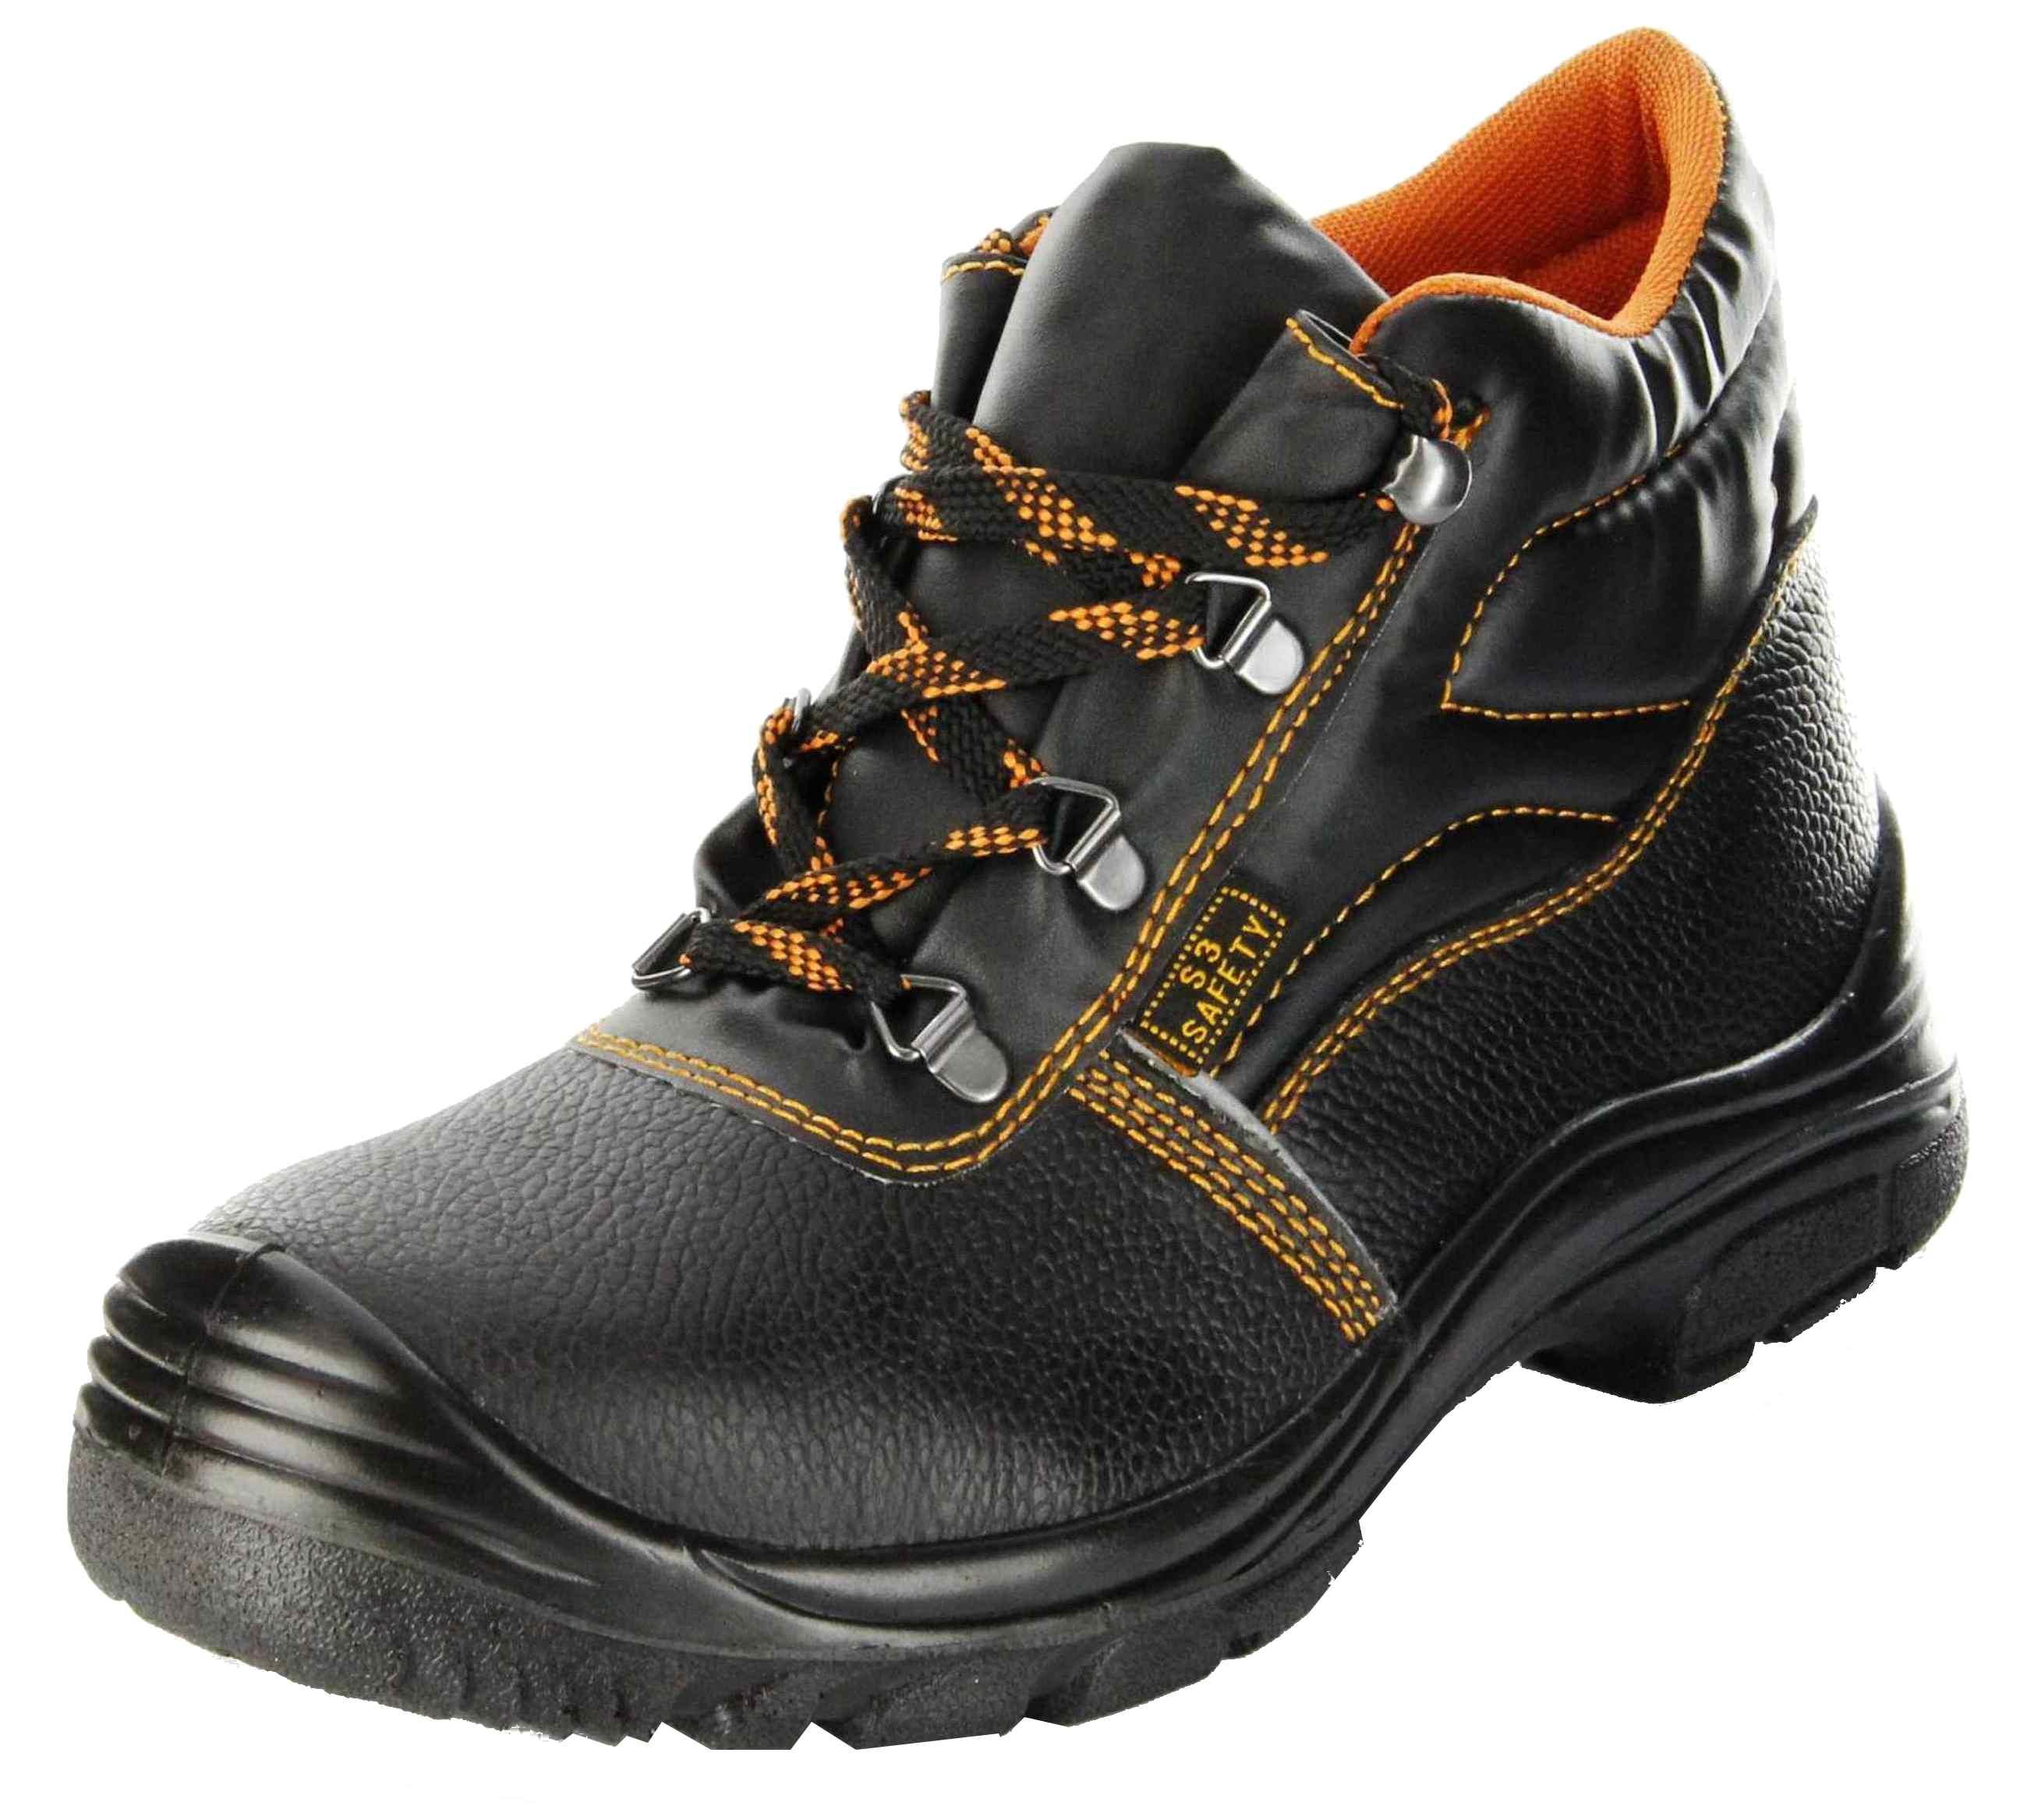 buy online 23e8e 55ef9 ConWay Sicherheitsschuh schwarz S3 SRC Stahlkappe Herren  Arbeits-Schutz-Schuhe Targa